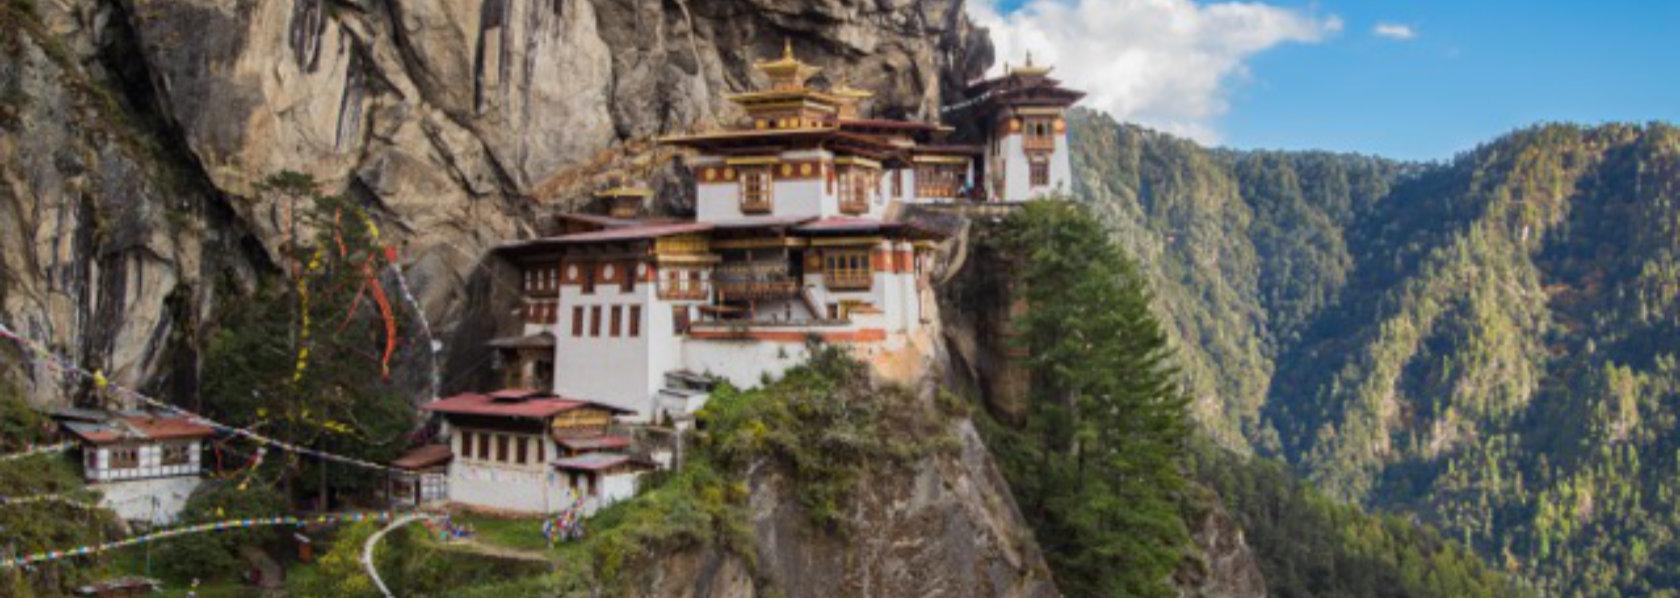 Paro Taktsang The Tigers Nest Monastery on cliffside - Precious Guru - THIS Buddhist Film Festival